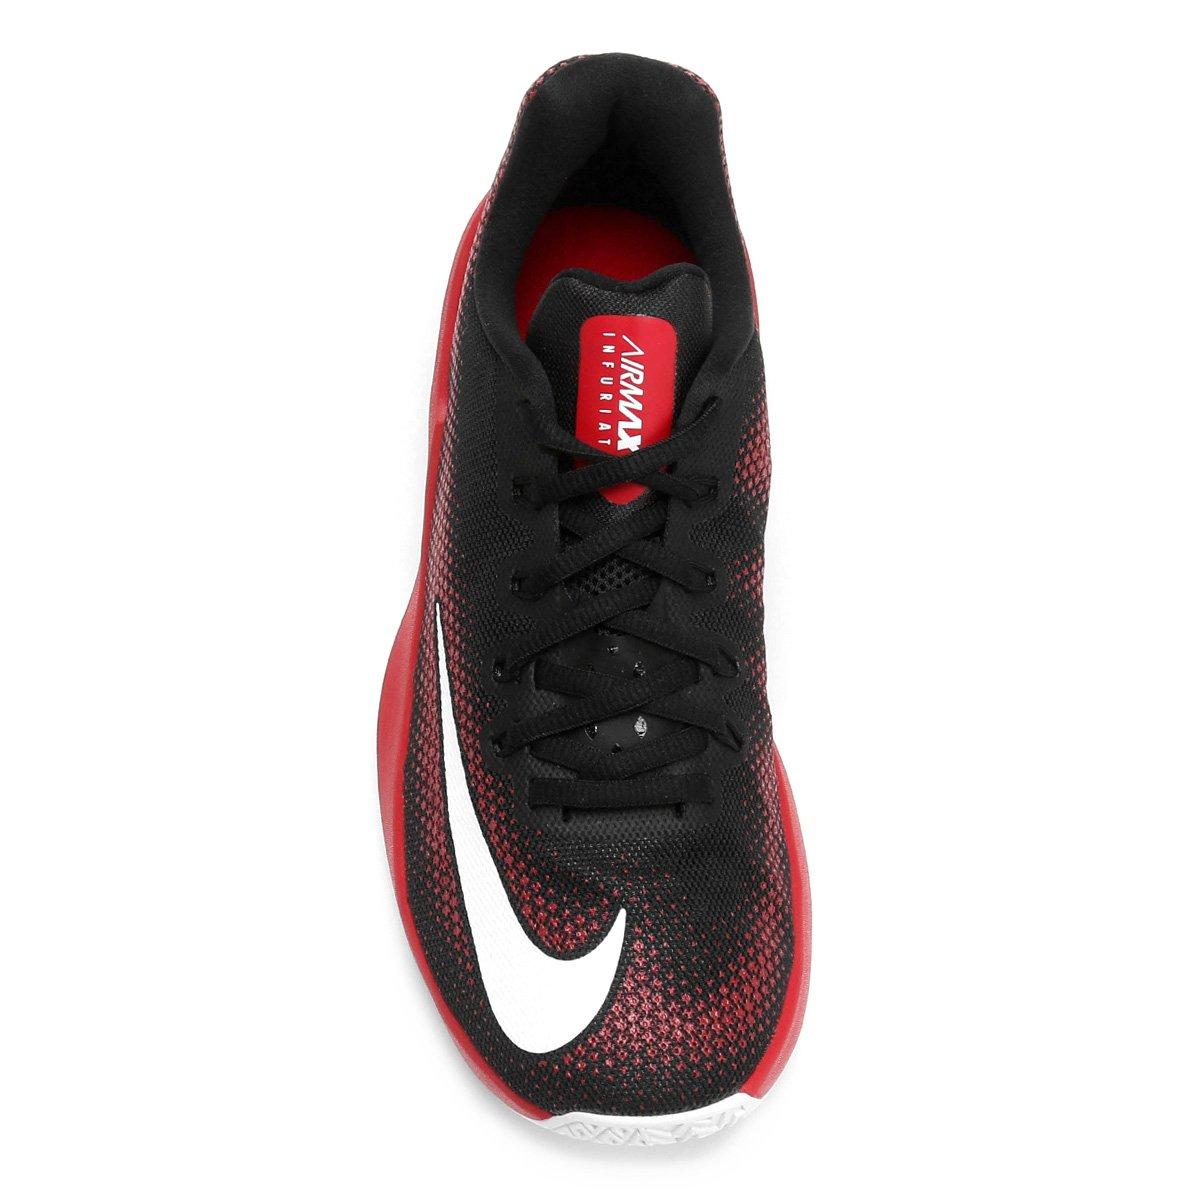 7aa9a4dc08 Tênis Nike Air Max Infuriate Low Masculino - Preto e Vermelho ...